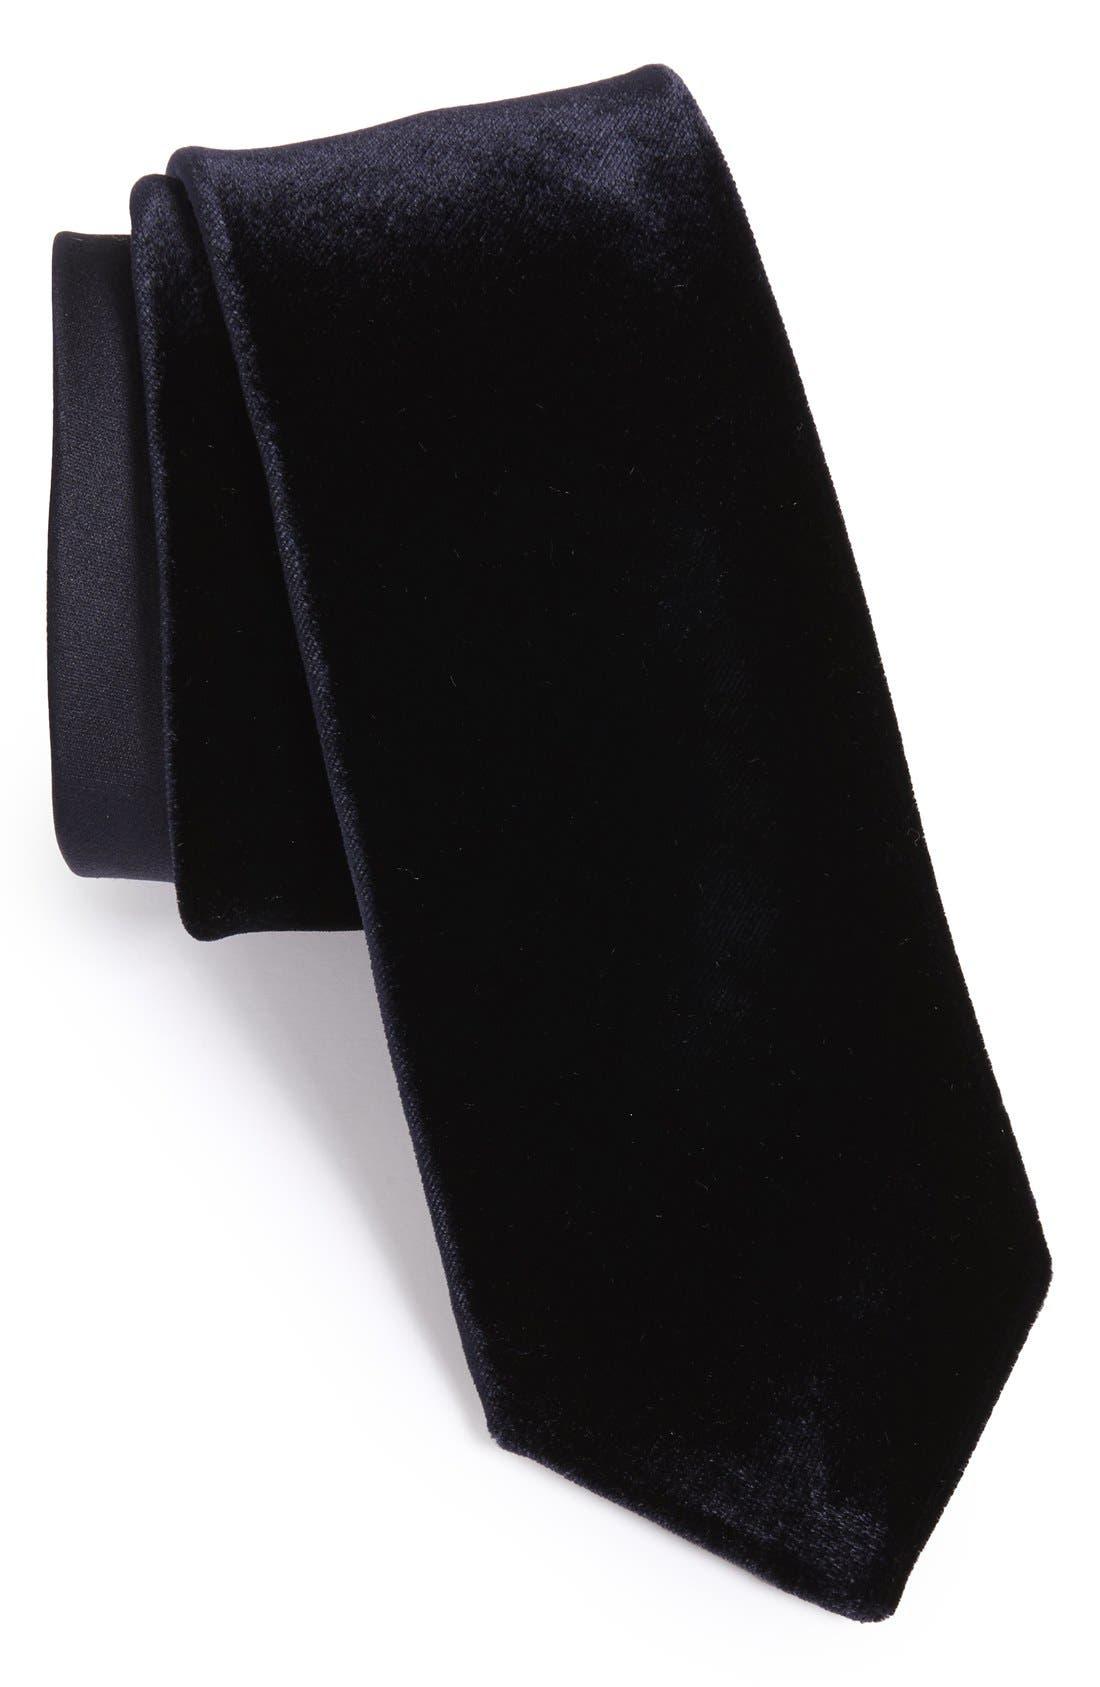 Main Image - Yves Saint Laurent Woven Tie